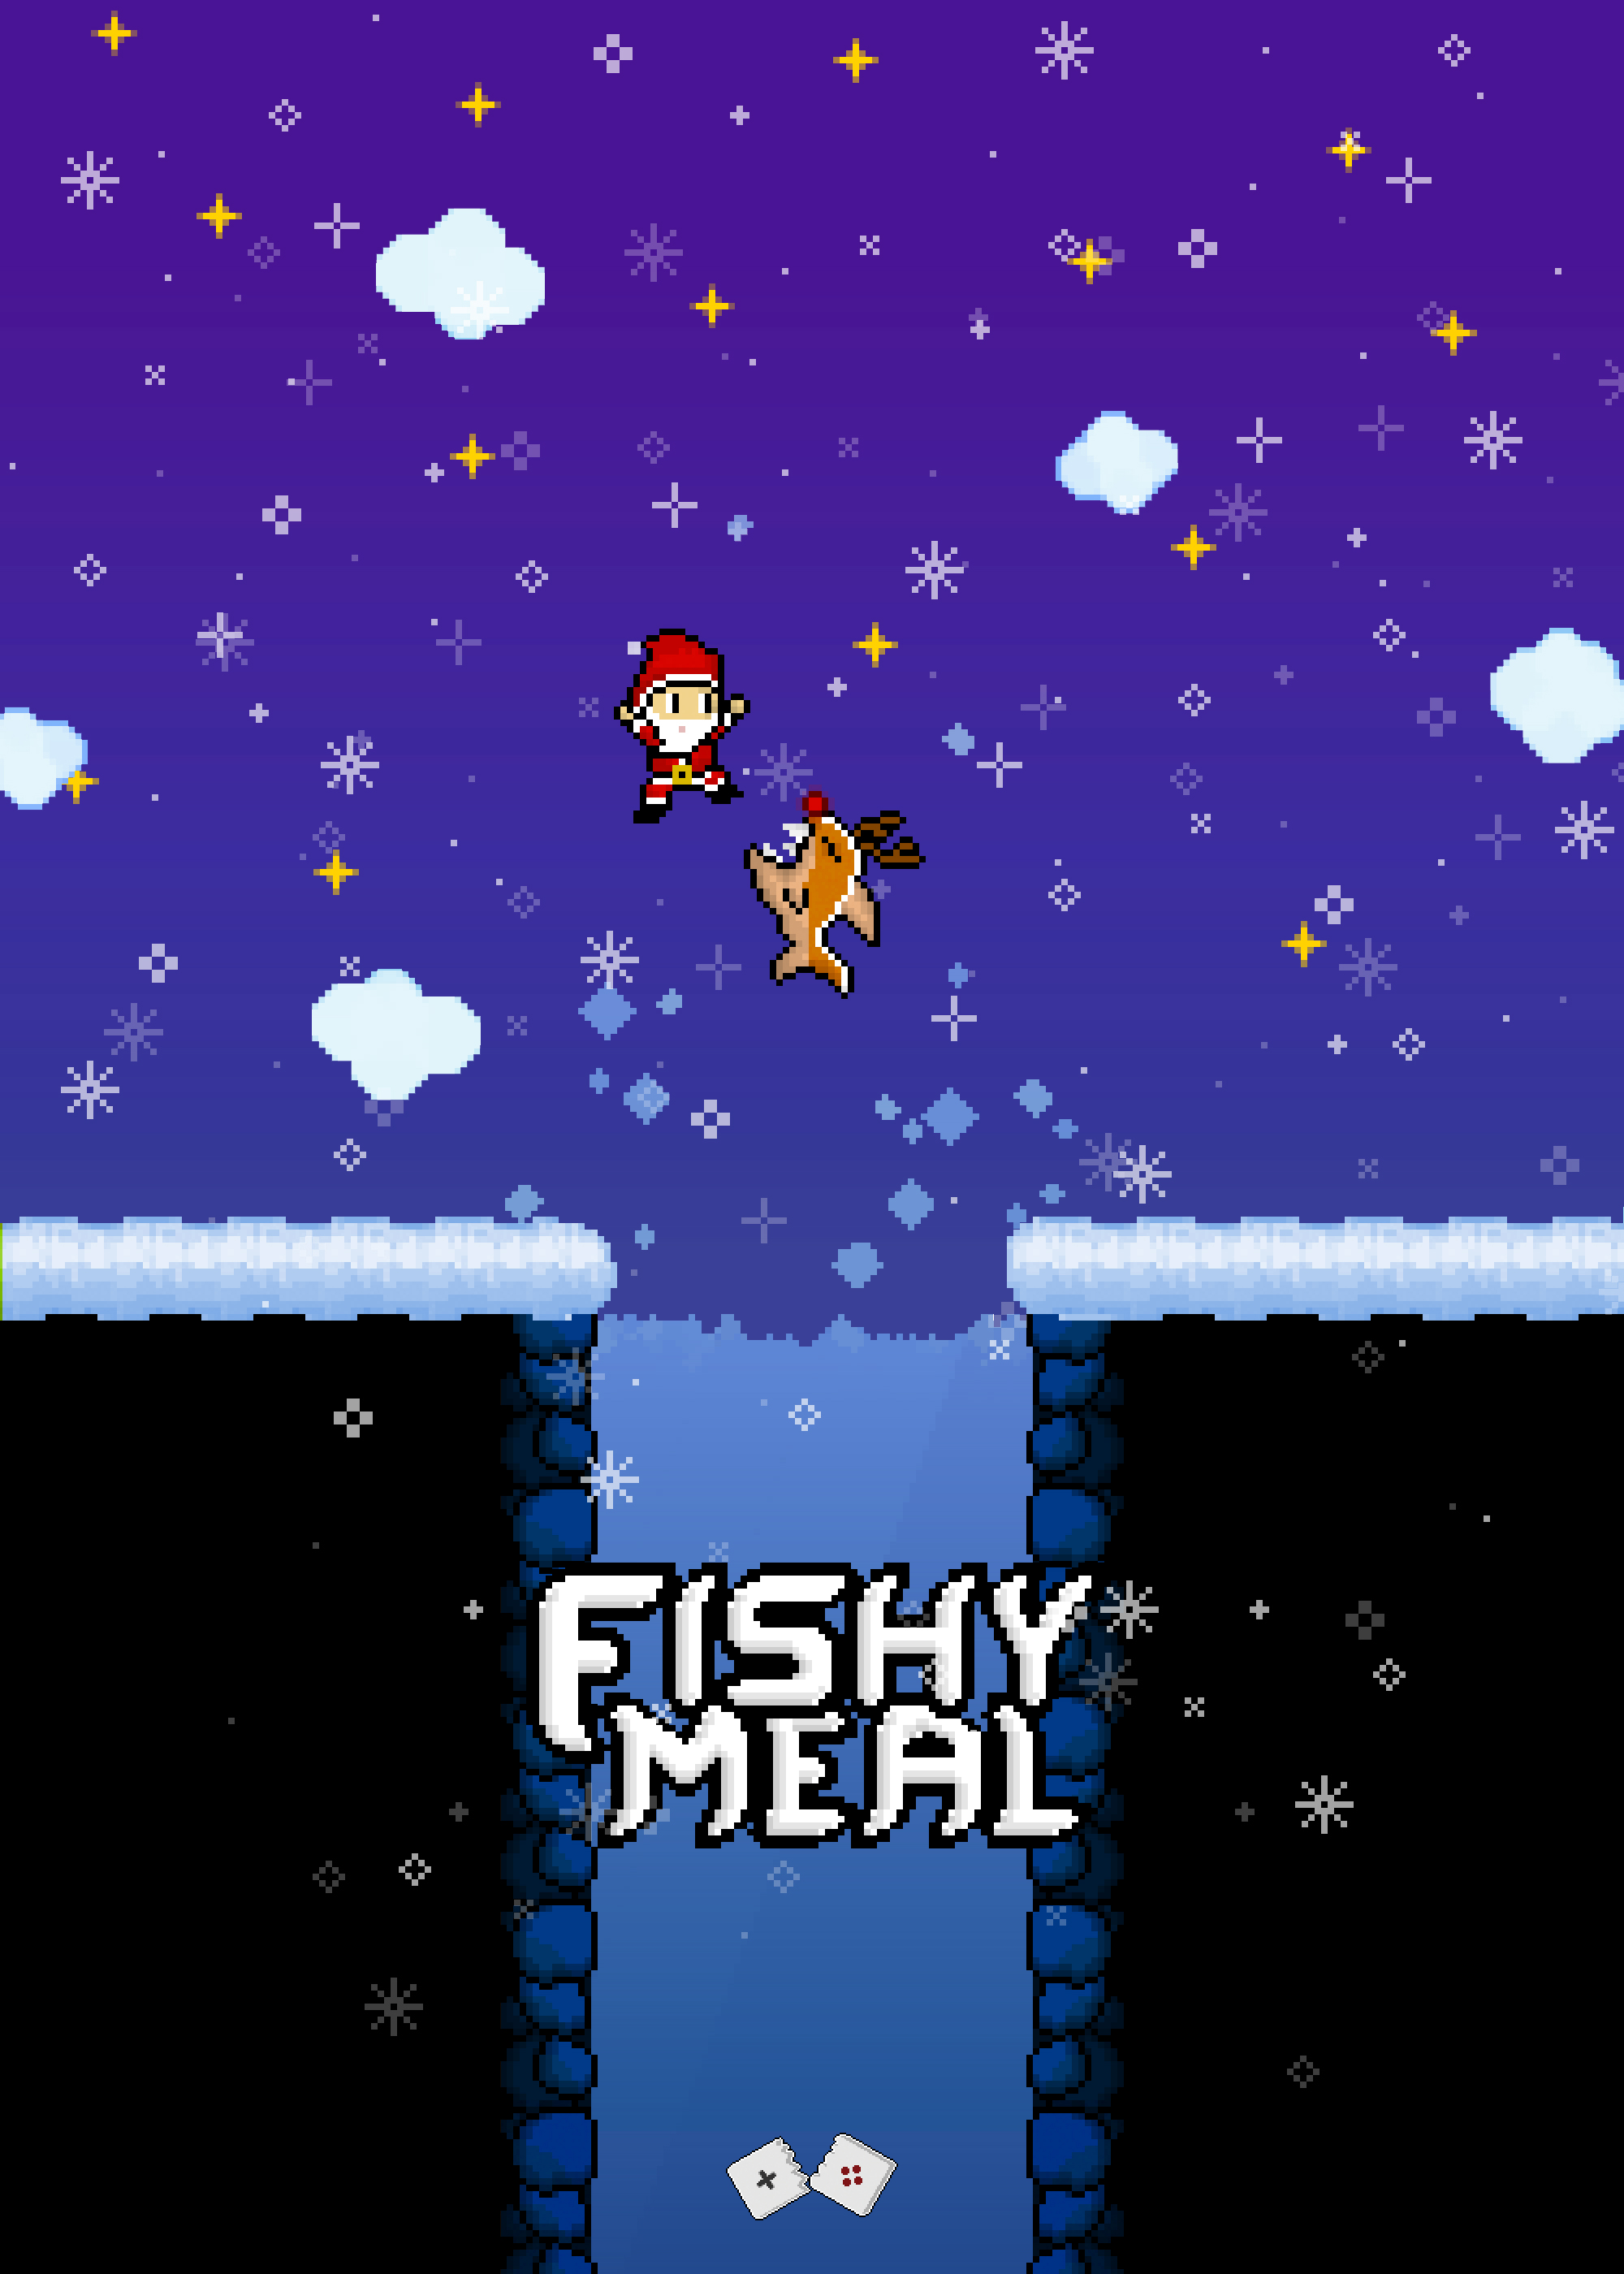 Piranha Rudolph and Santa in Fishy Meal greeting card